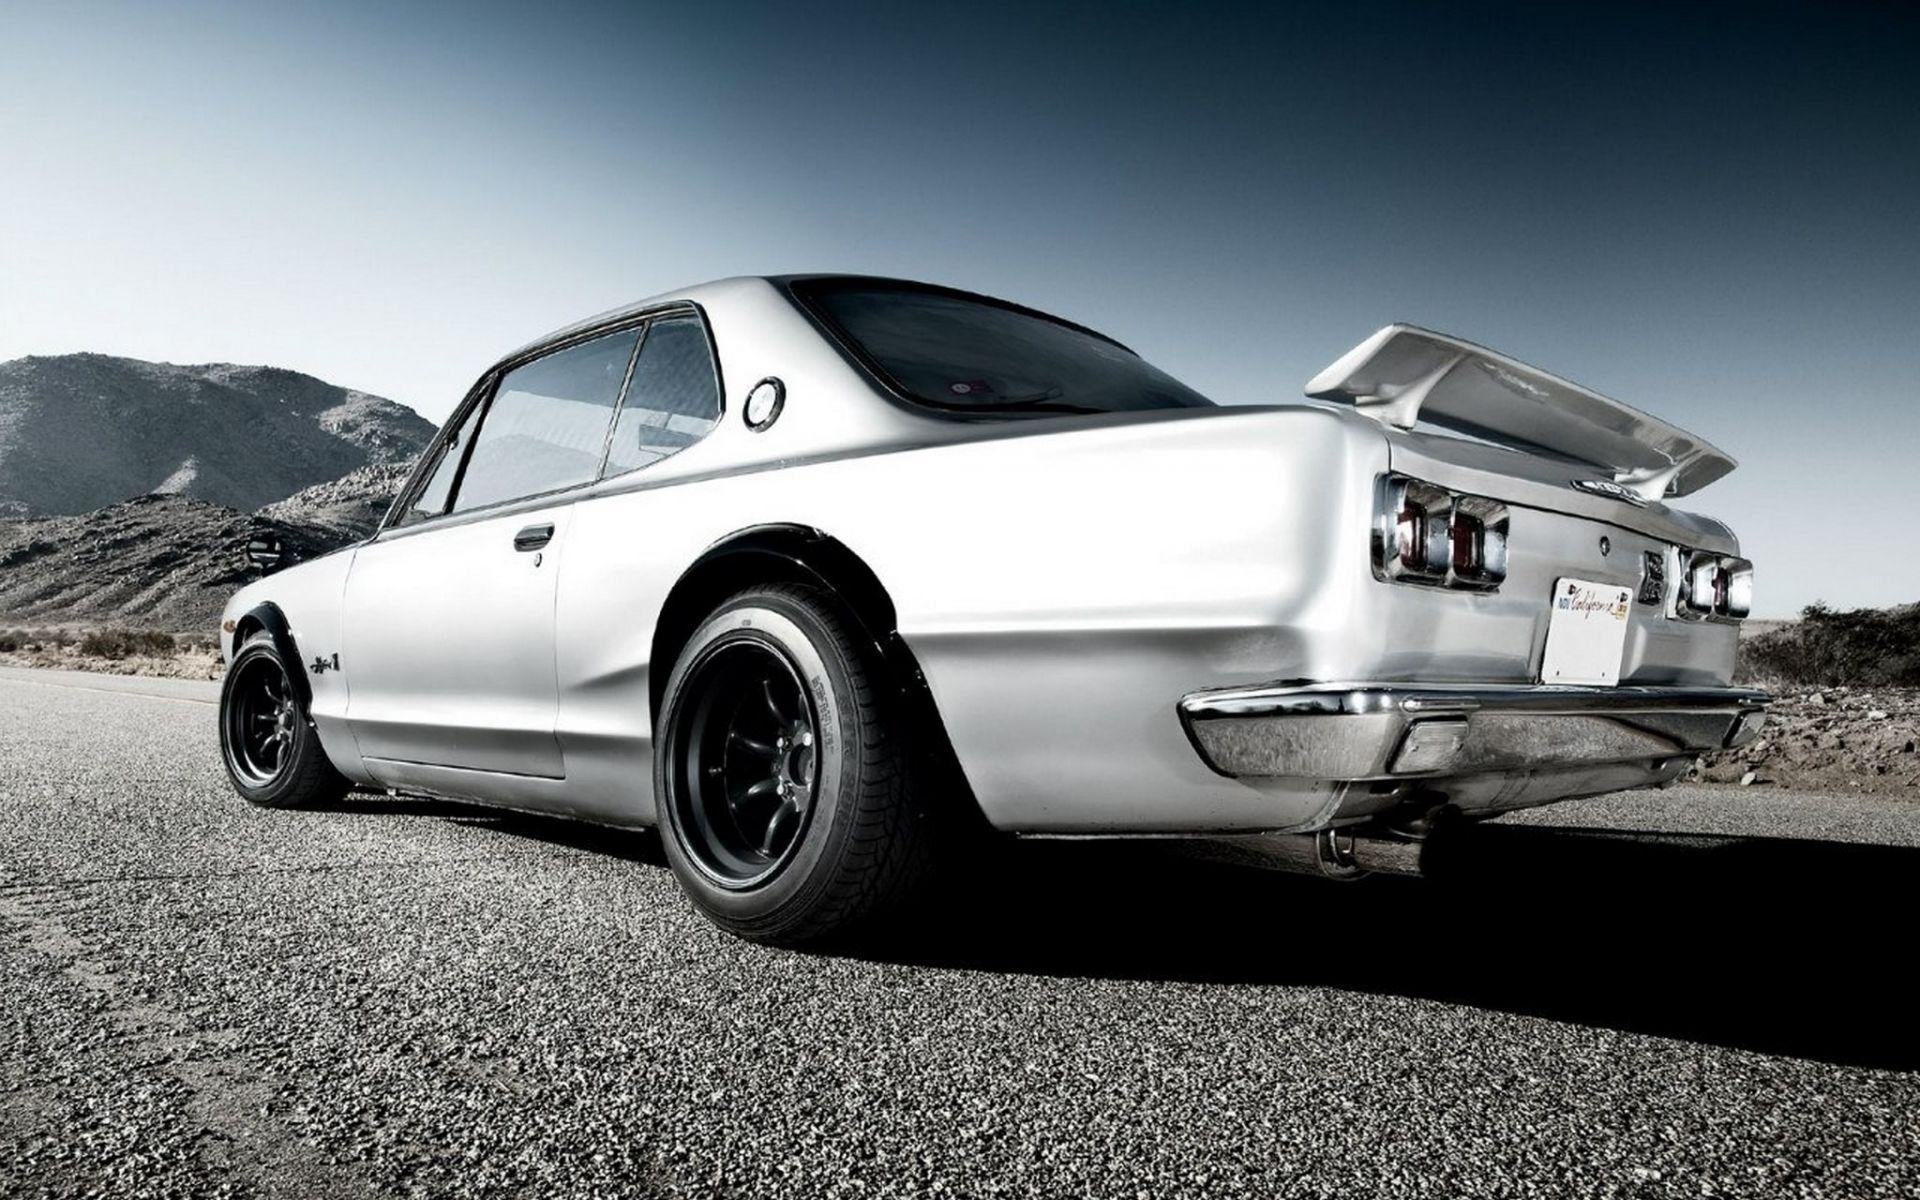 Garage Jd Autos >> Classic cars jdm nissan skyline 2000 gtr hakosuka tuning wallpaper | 1920x1200 | 30279 ...